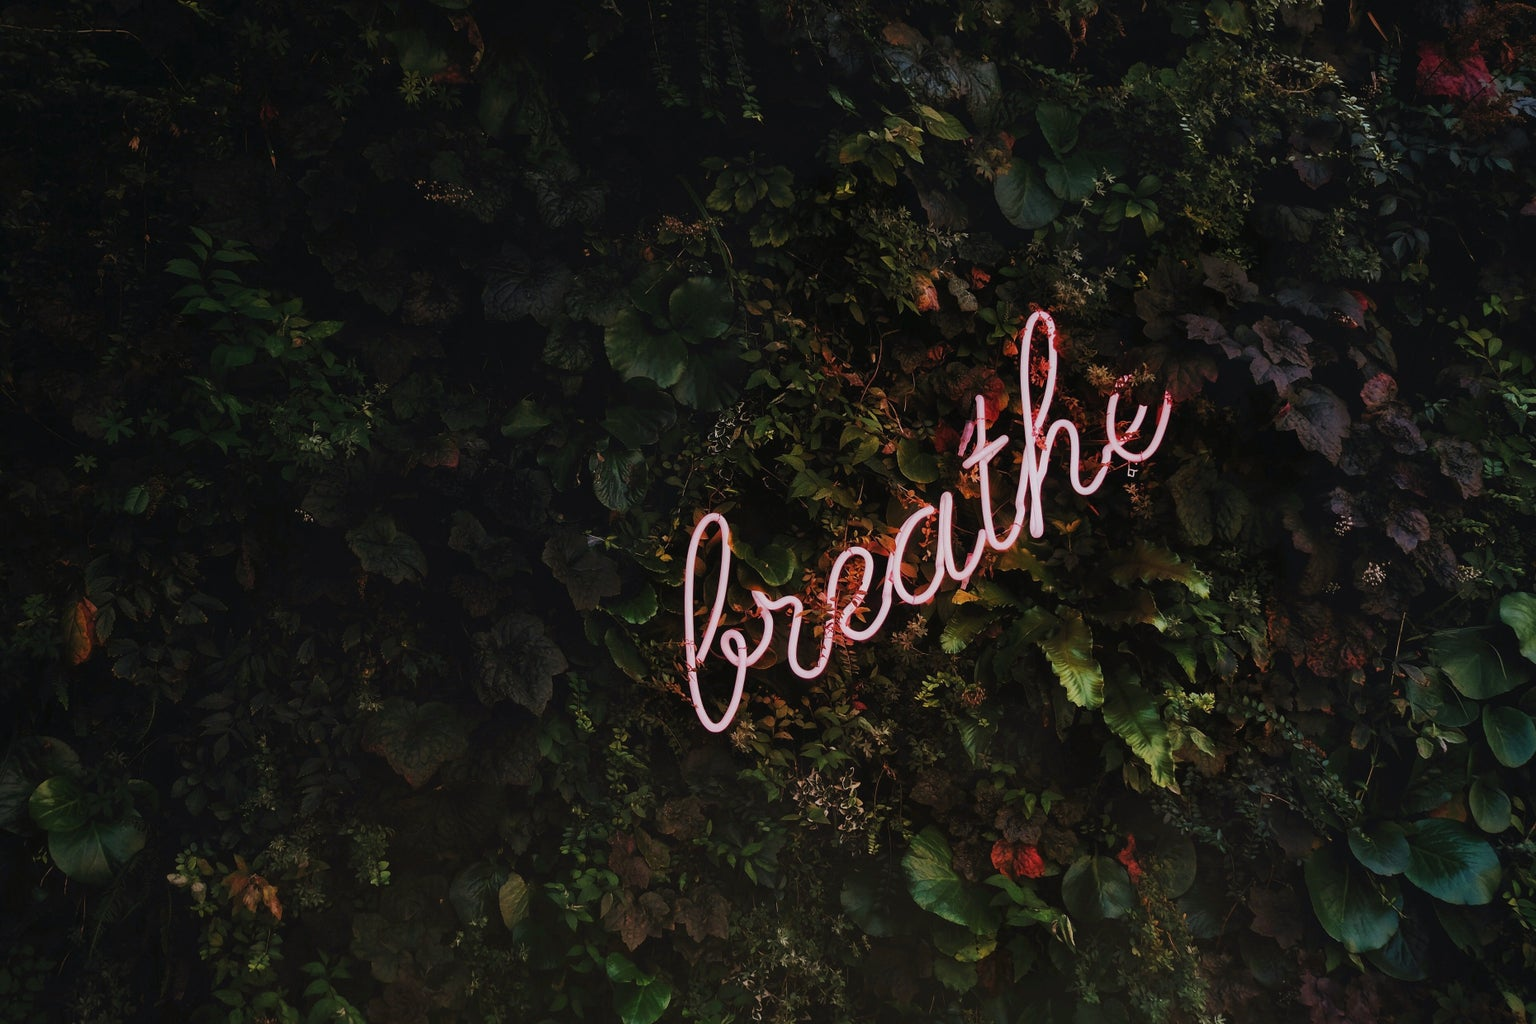 Breath sign